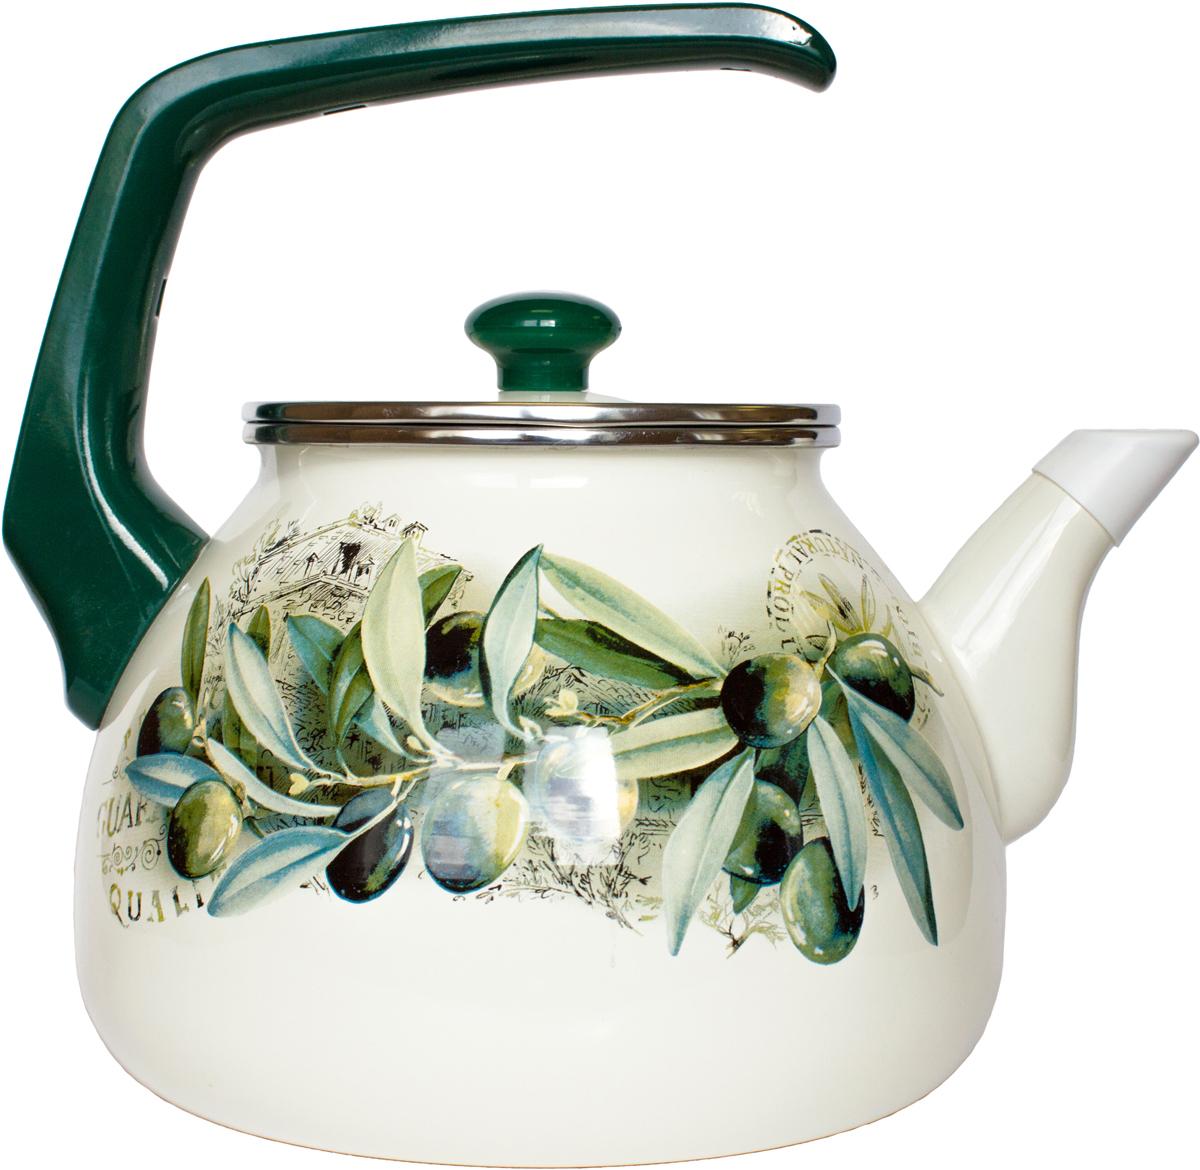 Чайник Interos Маслины, 3 л набор посуды interos 15231 маслины